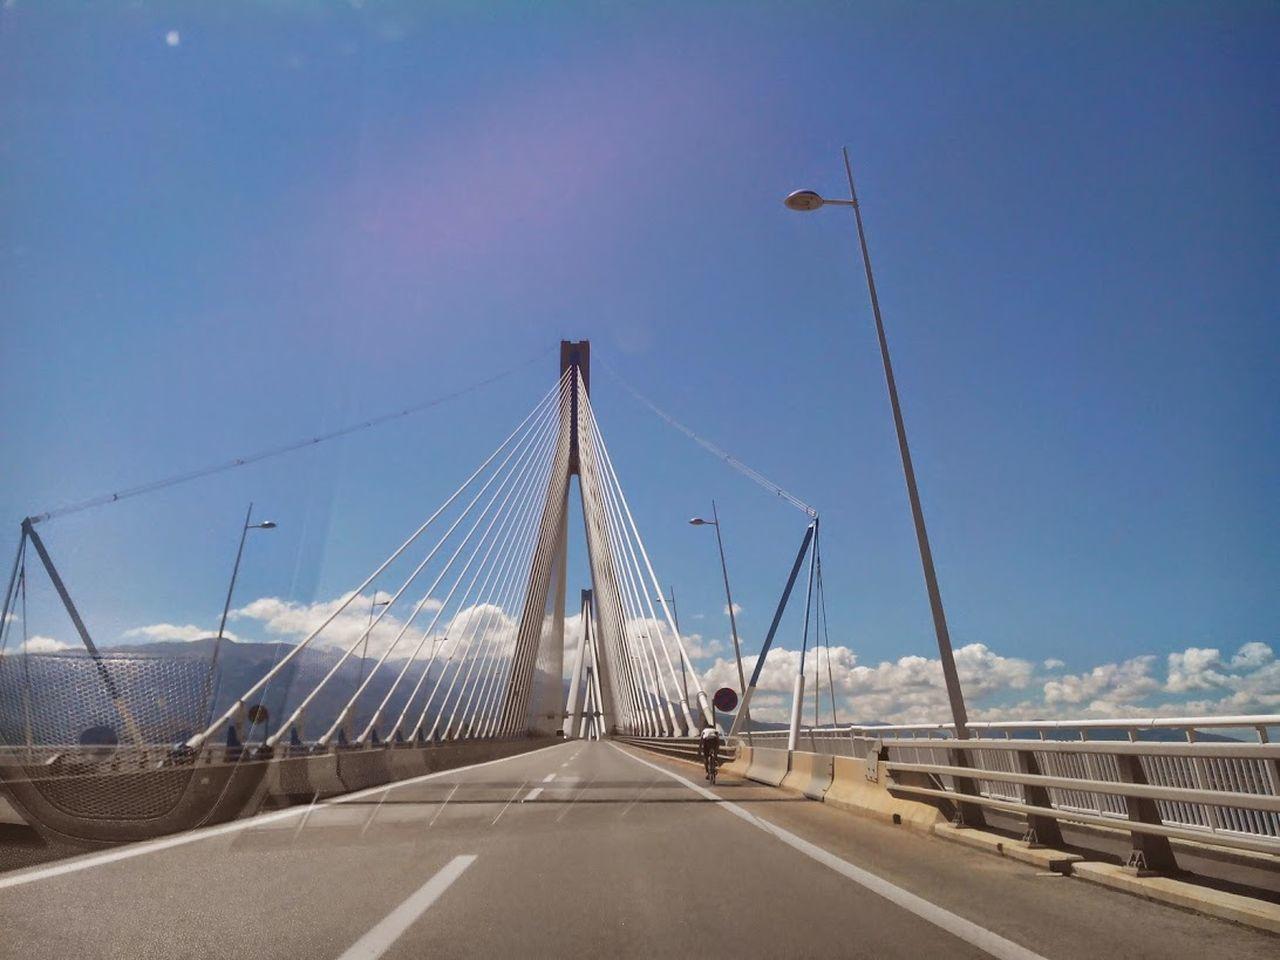 Patras Bridge Greece Architecture Bridge - Man Made Structure Connection Day No People Outdoors Sea Sky Suspension Bridge Travel Travel Destinations